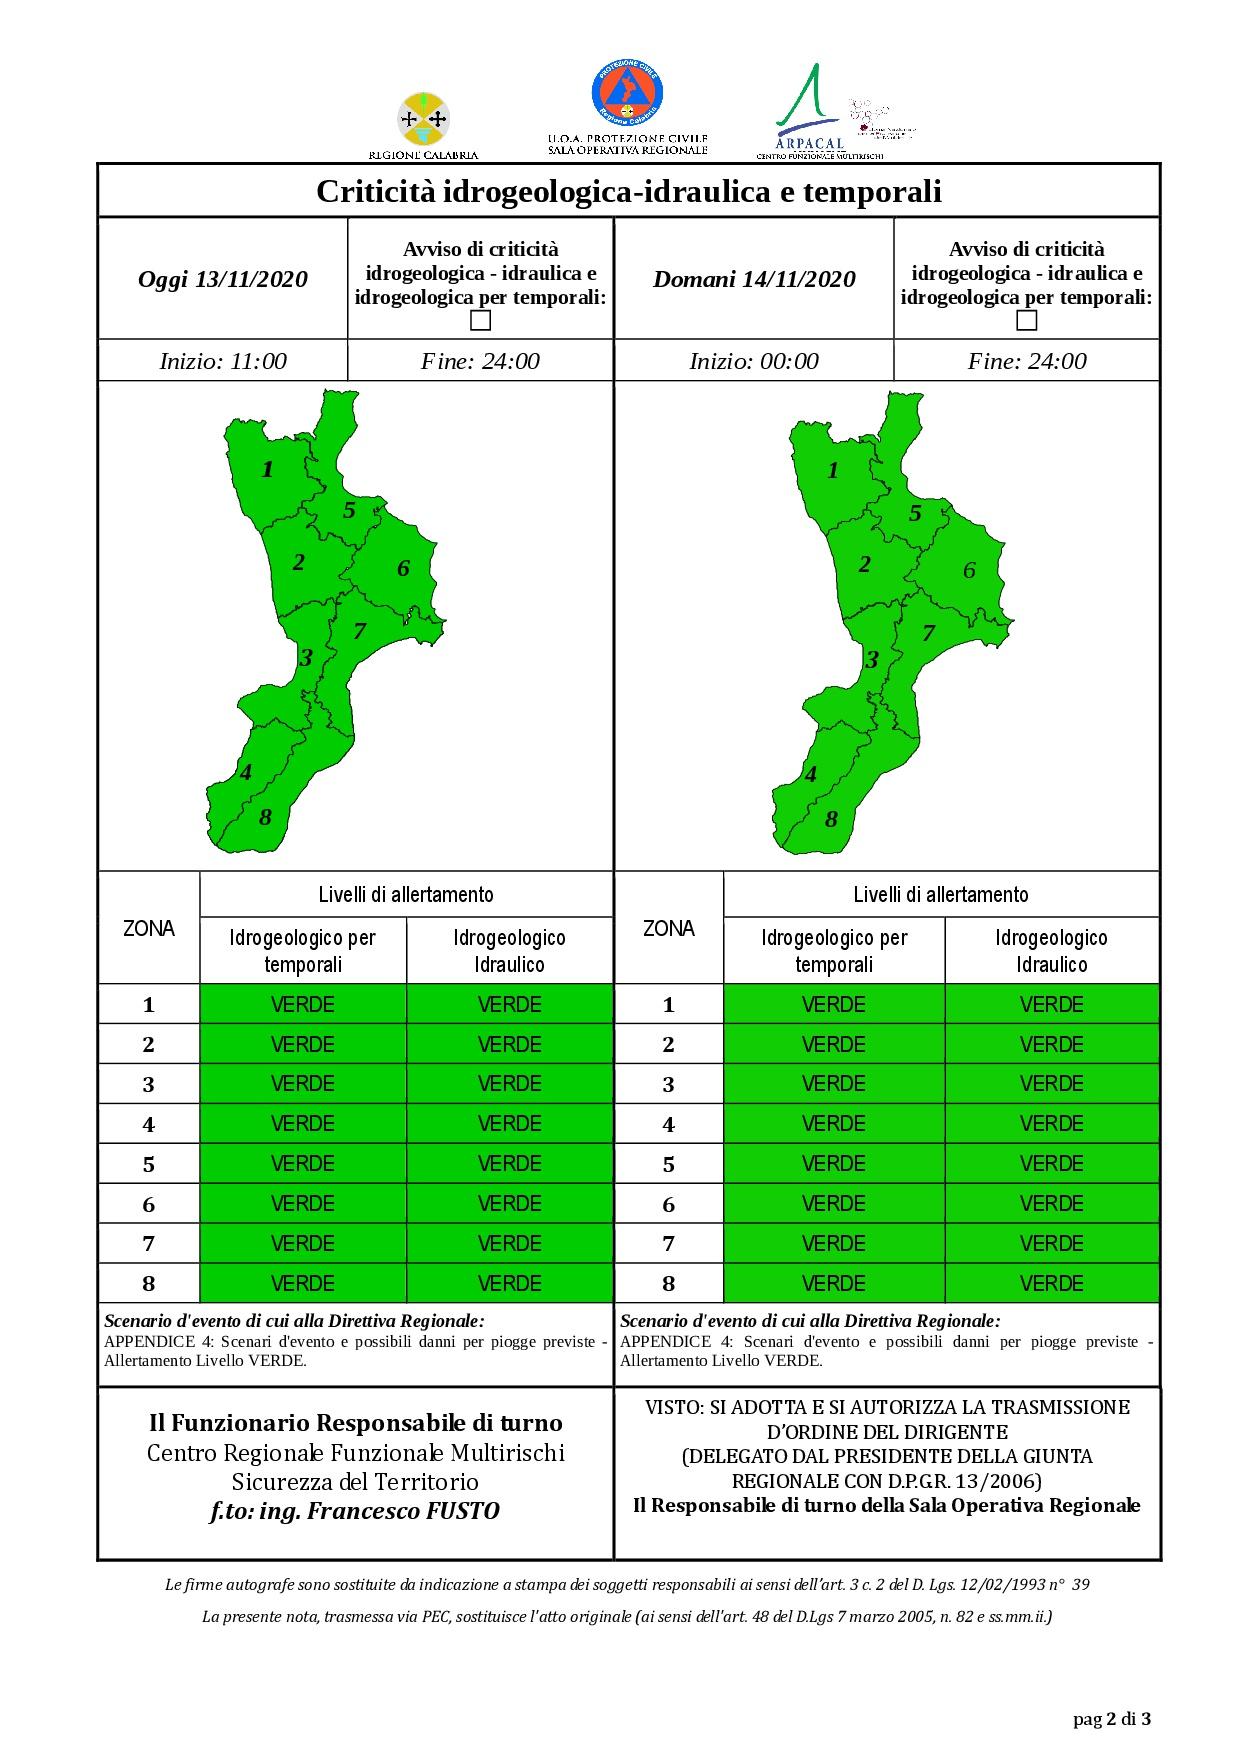 Criticità idrogeologica-idraulica e temporali in Calabria 13-11-2020